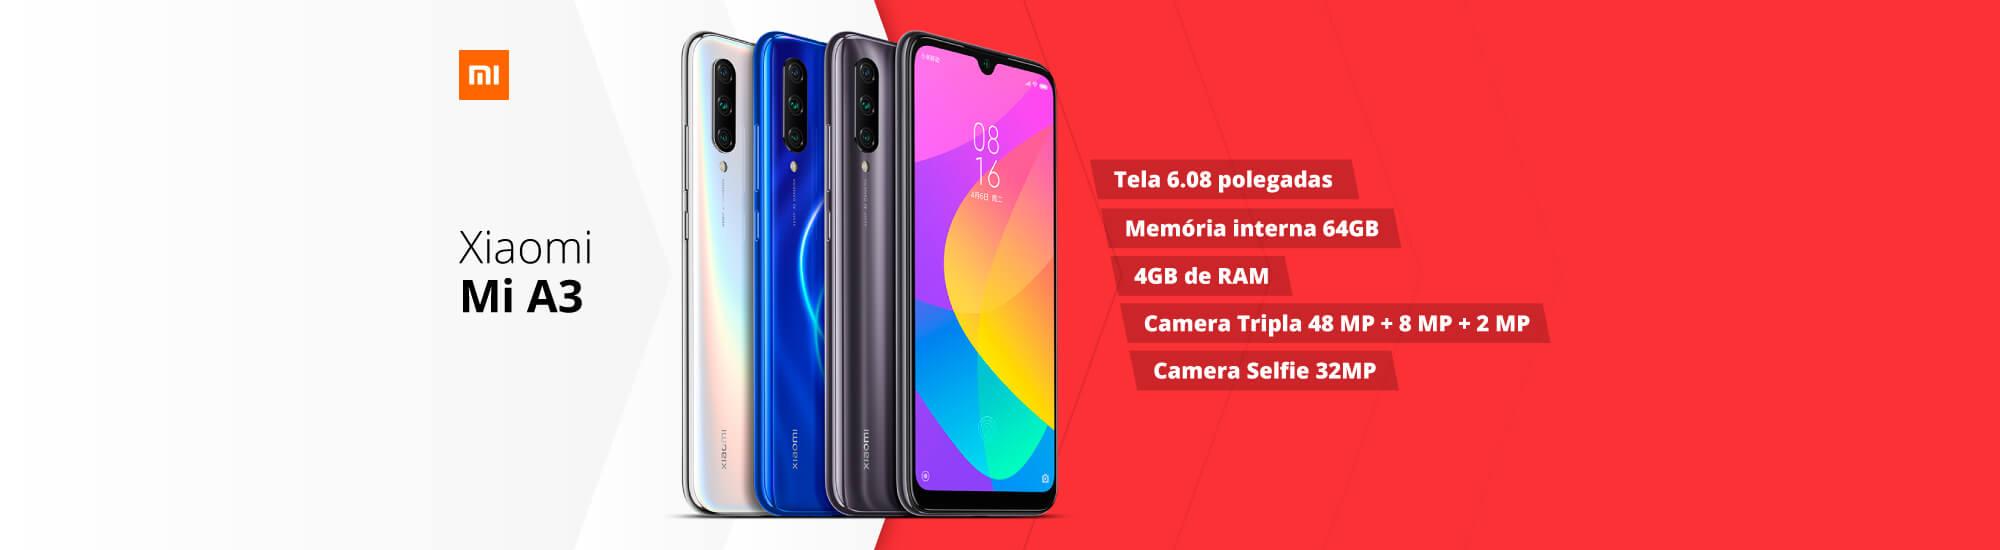 Xiaomi Mi A3: Conheça!